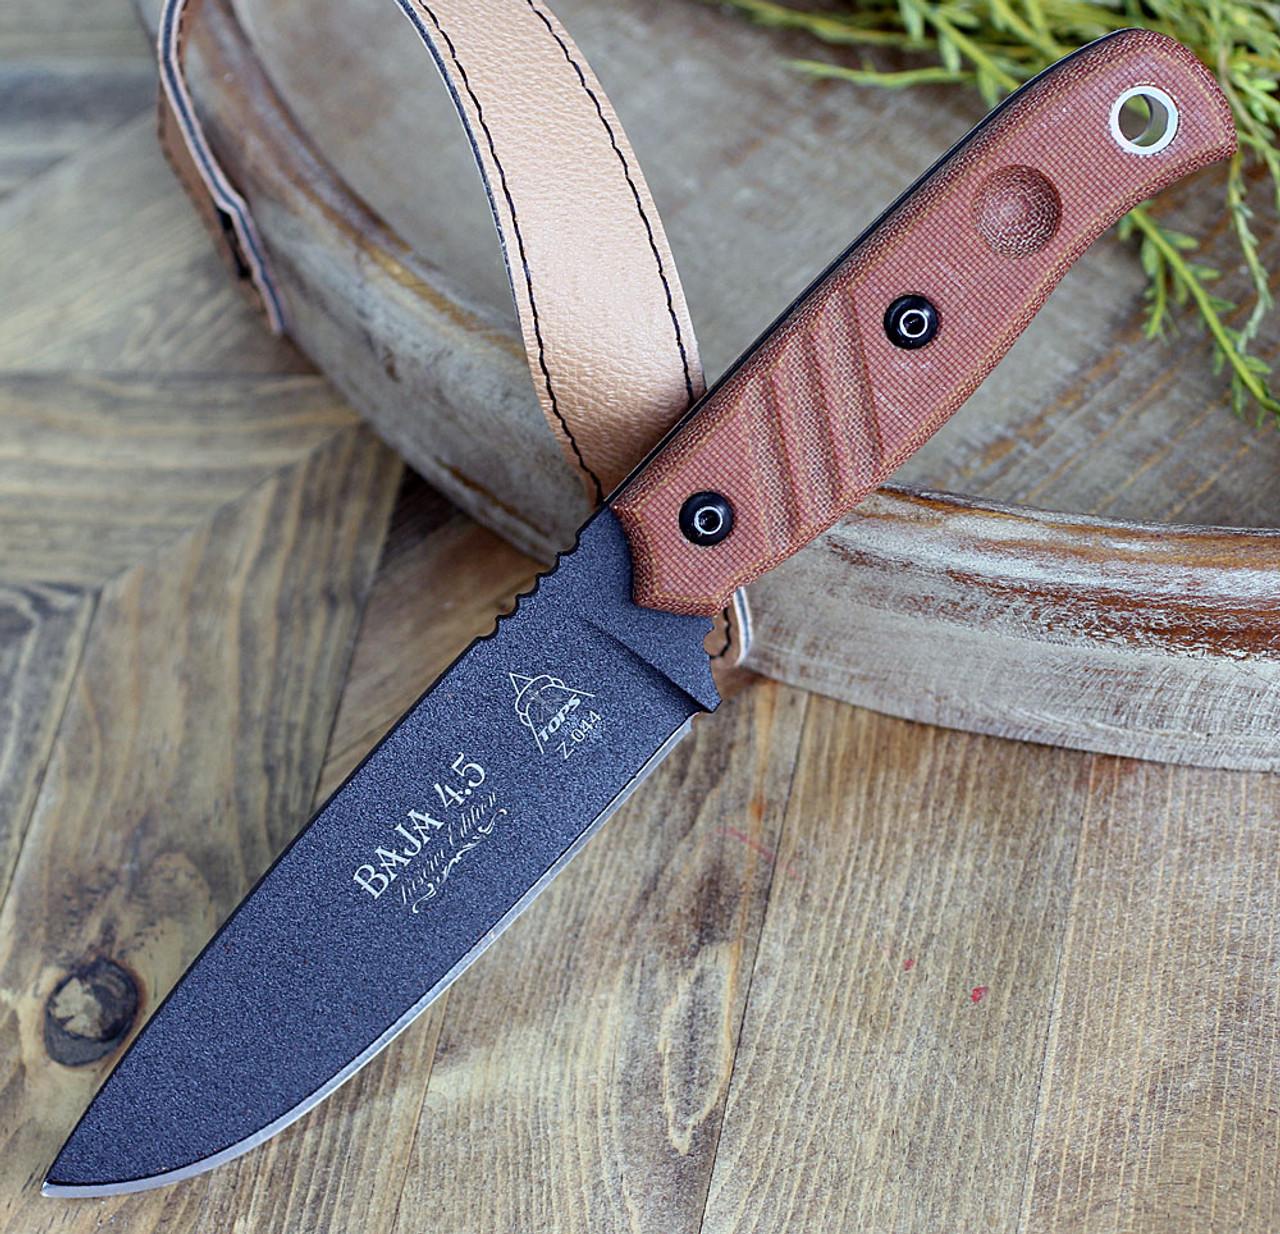 "TOPS Knives TPBAJA-4.5R Baja 4.5 Reserve Edition 4.88"" 1095 RC Black Traction Coating, Tan Canvas Micarta Handles, Brown Leather Sheath"